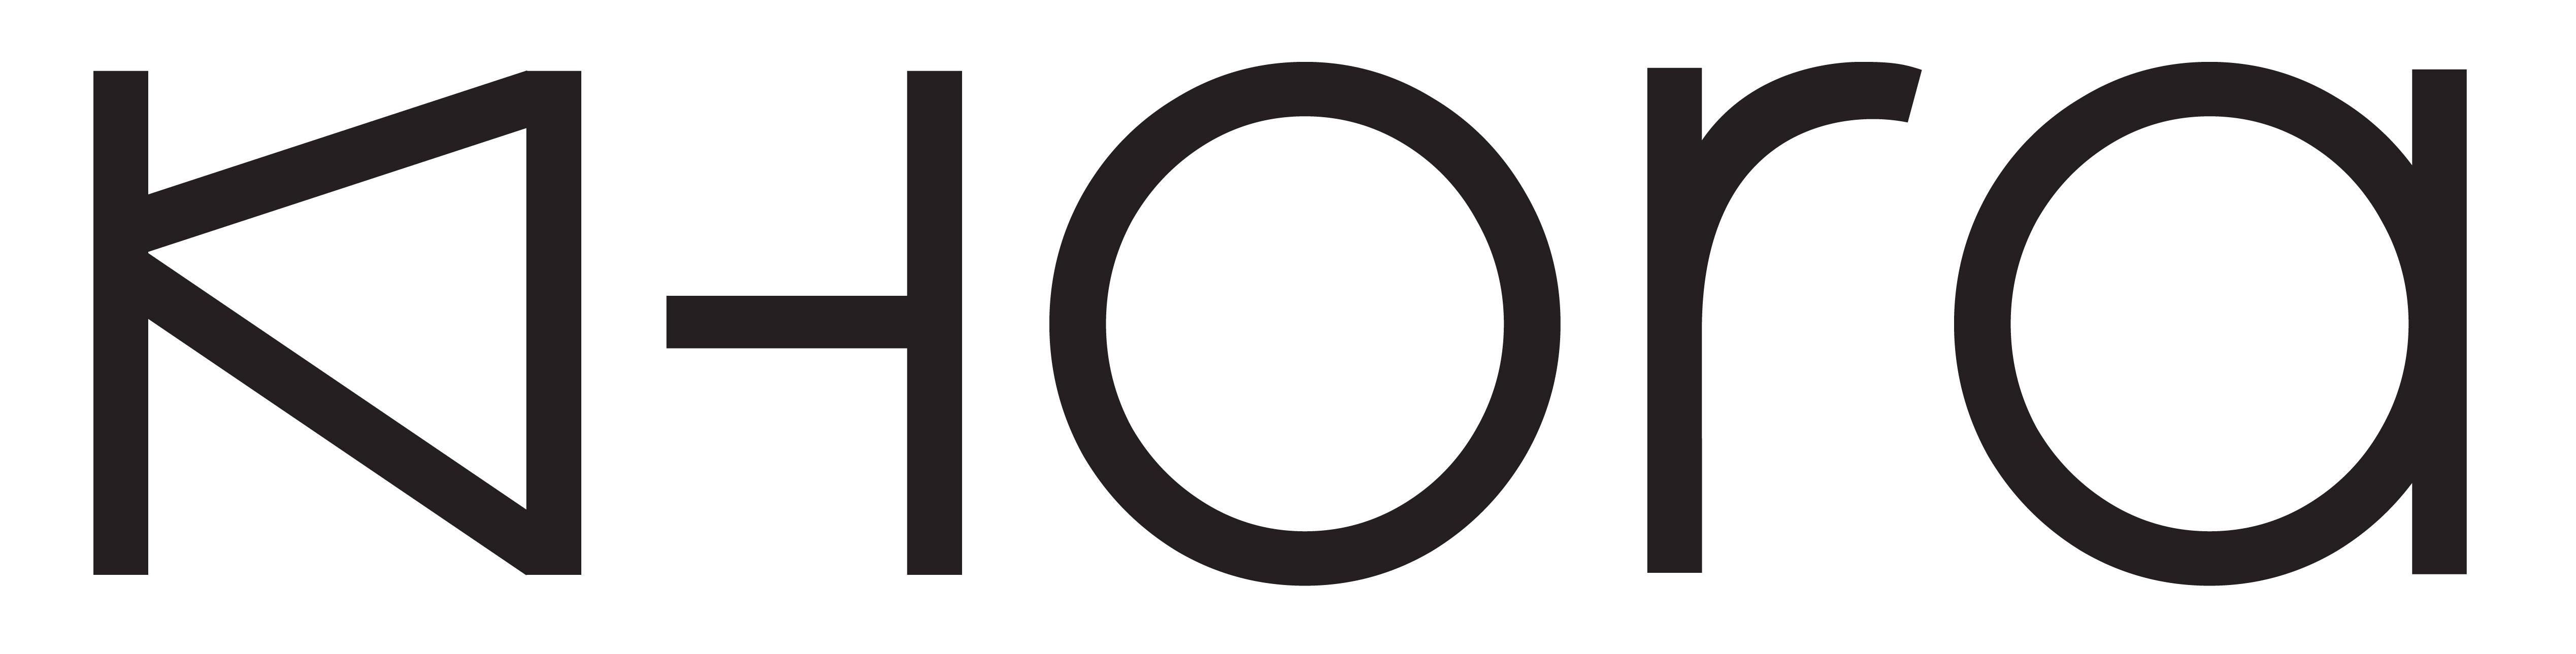 Rex Nichols Architects Rebranded As Studio KHORA